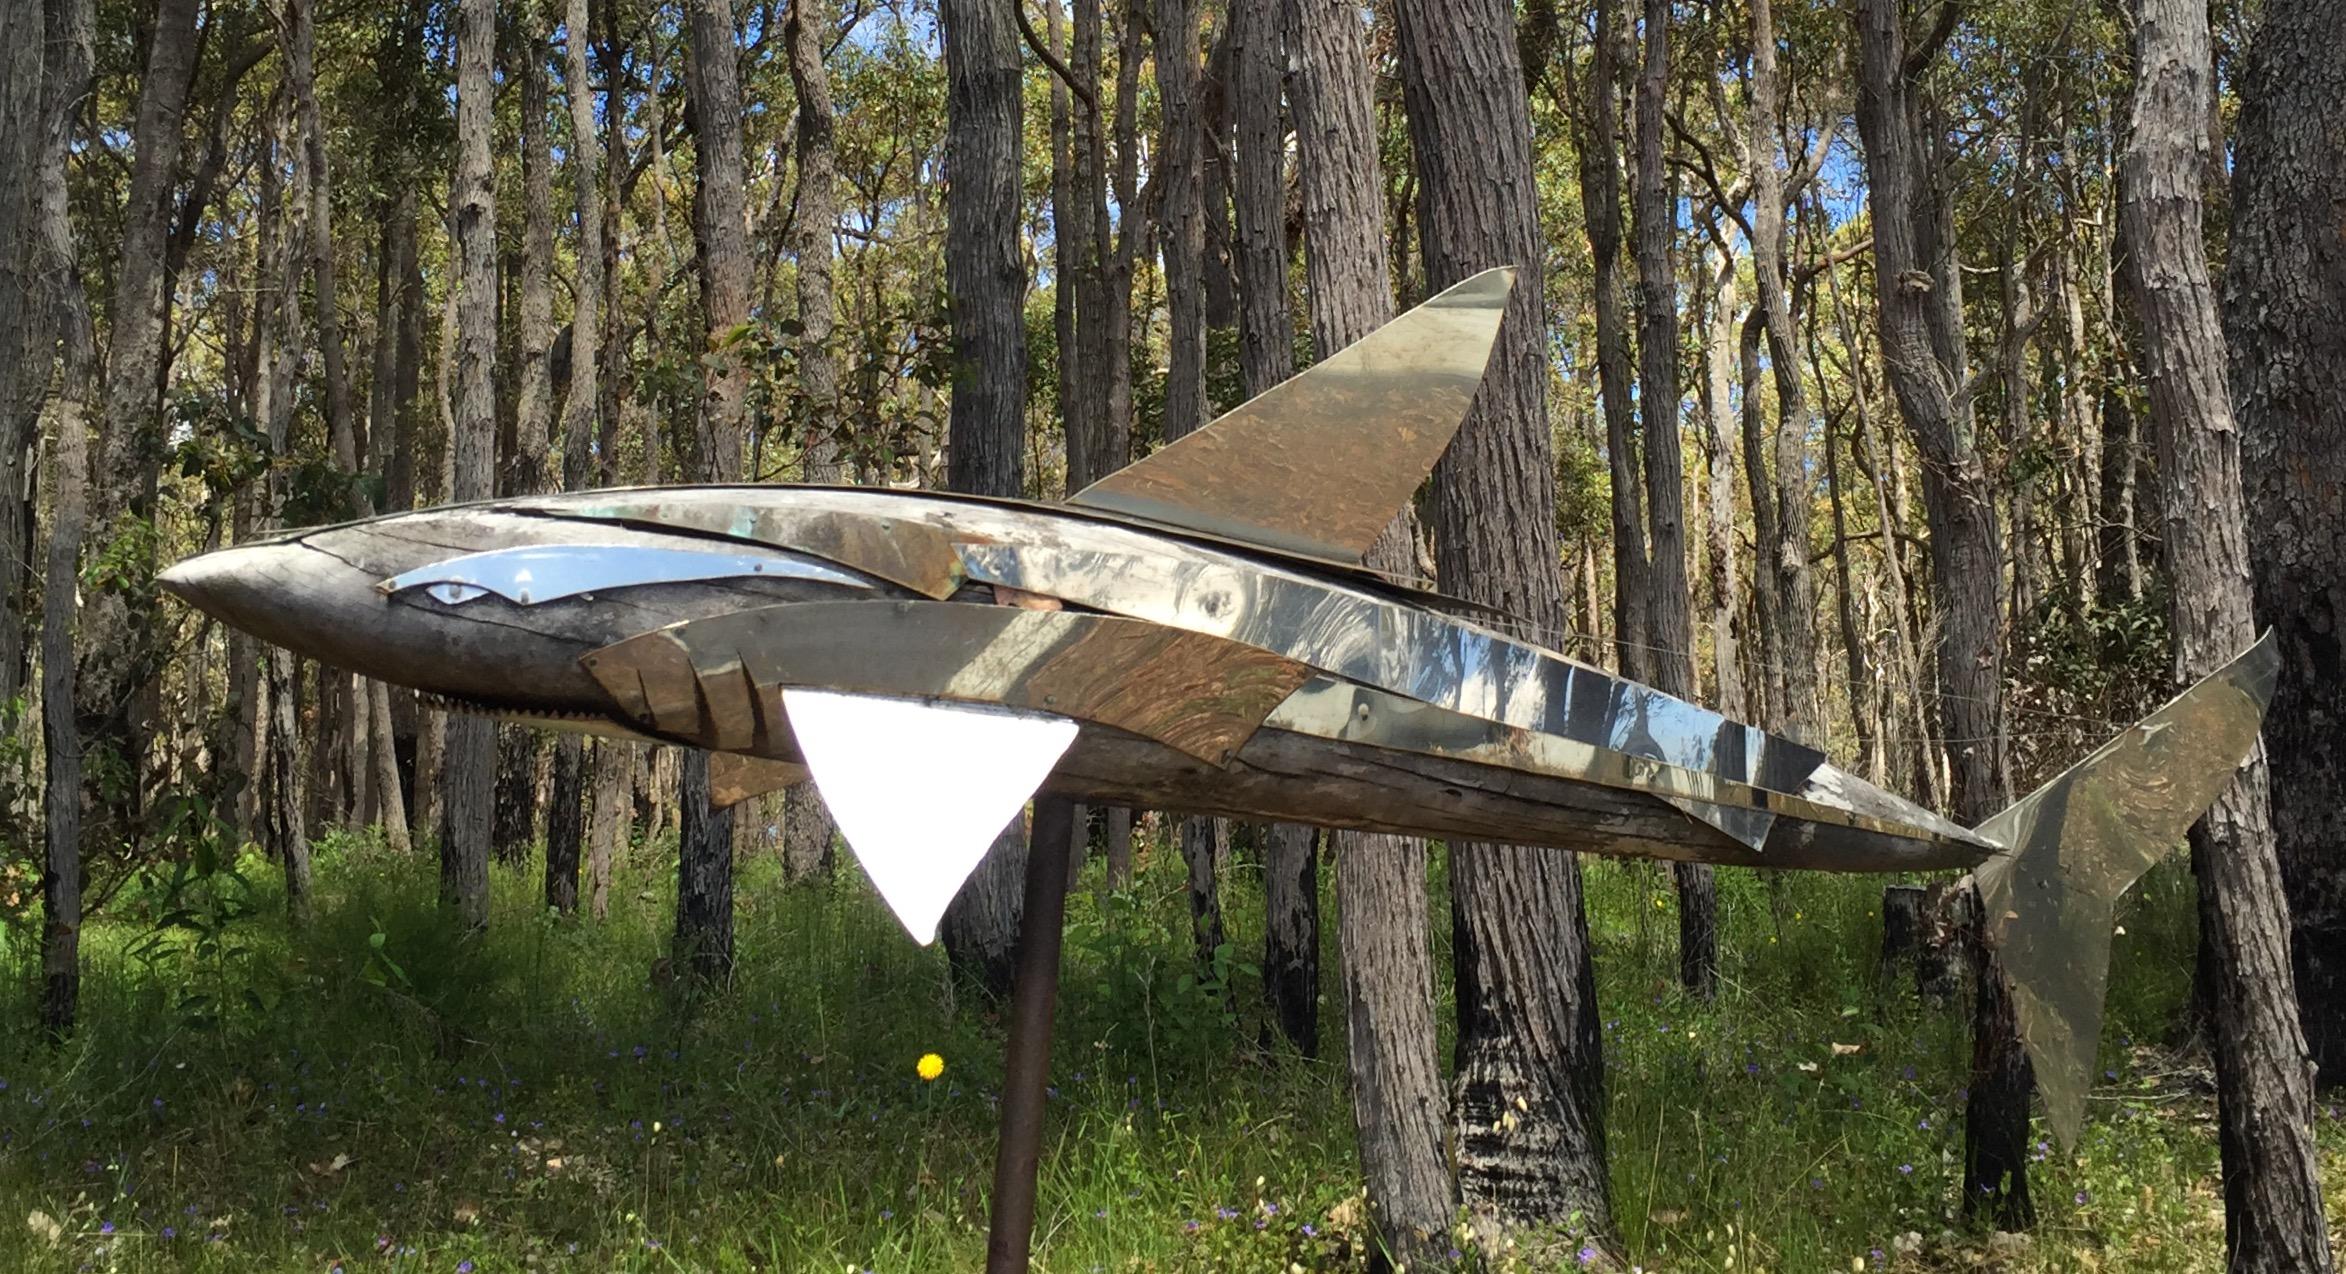 N.Lullfitz-shark-wood-and-stainless-steel-1mx1.2mx1.4m.jpg